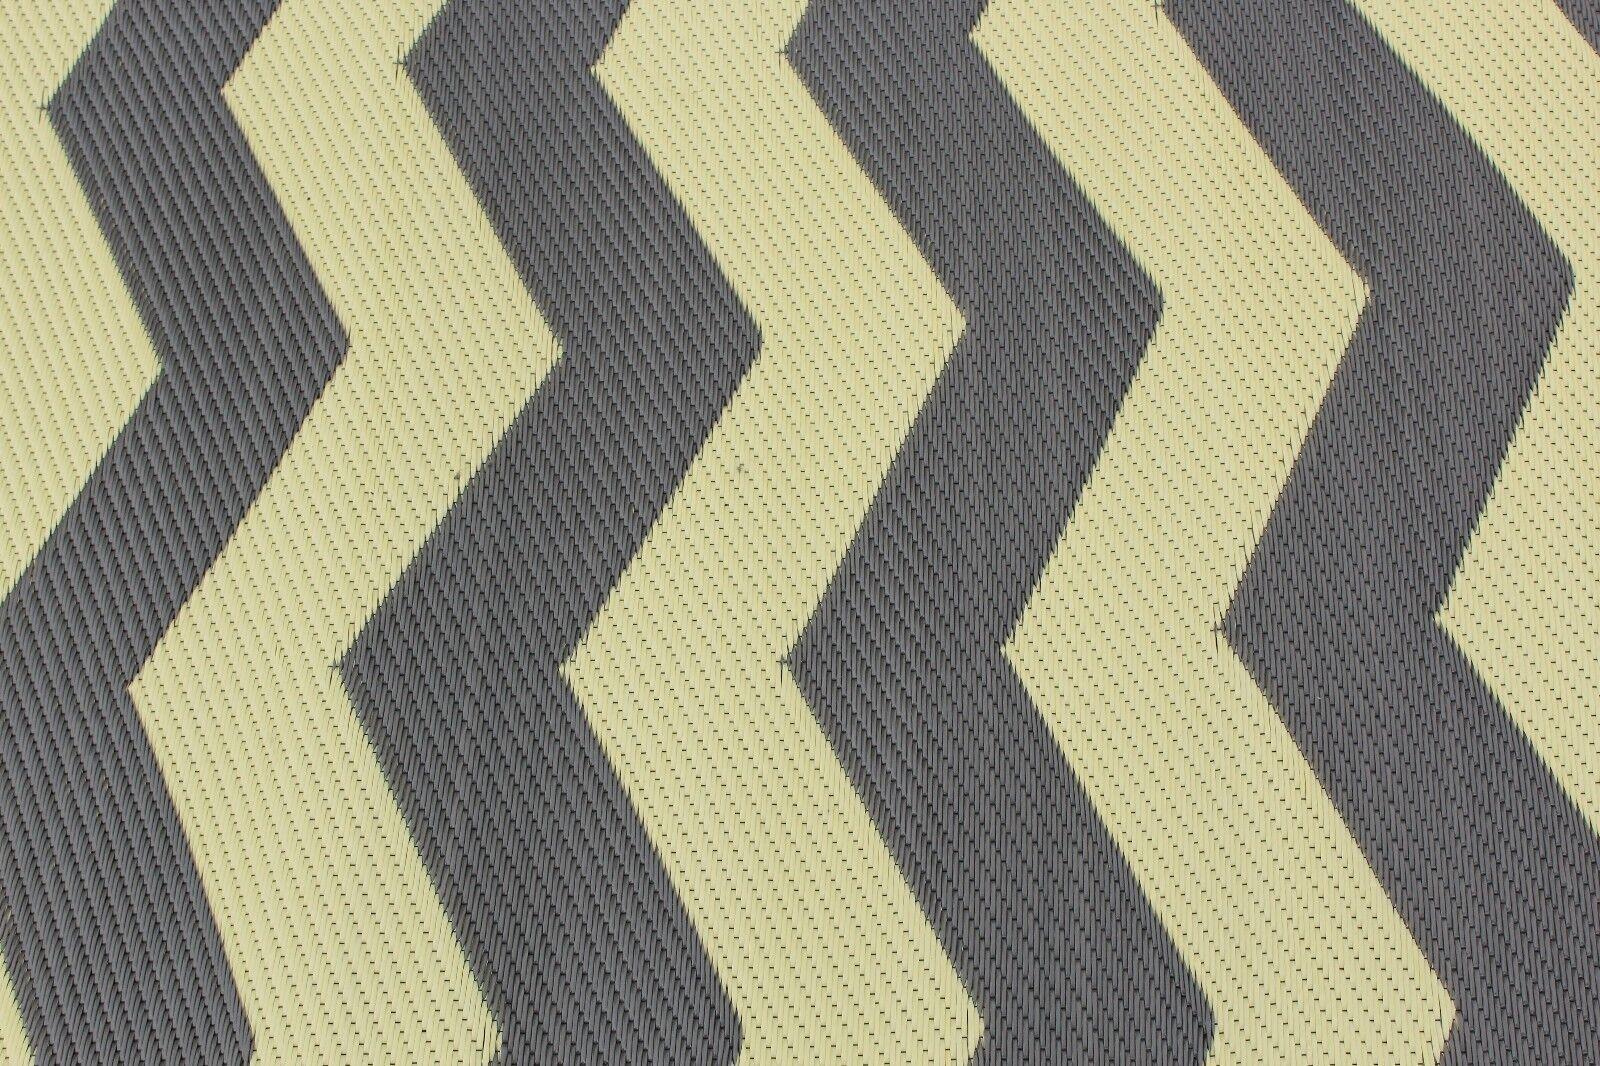 Rv Patio Rug Indoor Outdoor Camping Mat Chevron Pattern